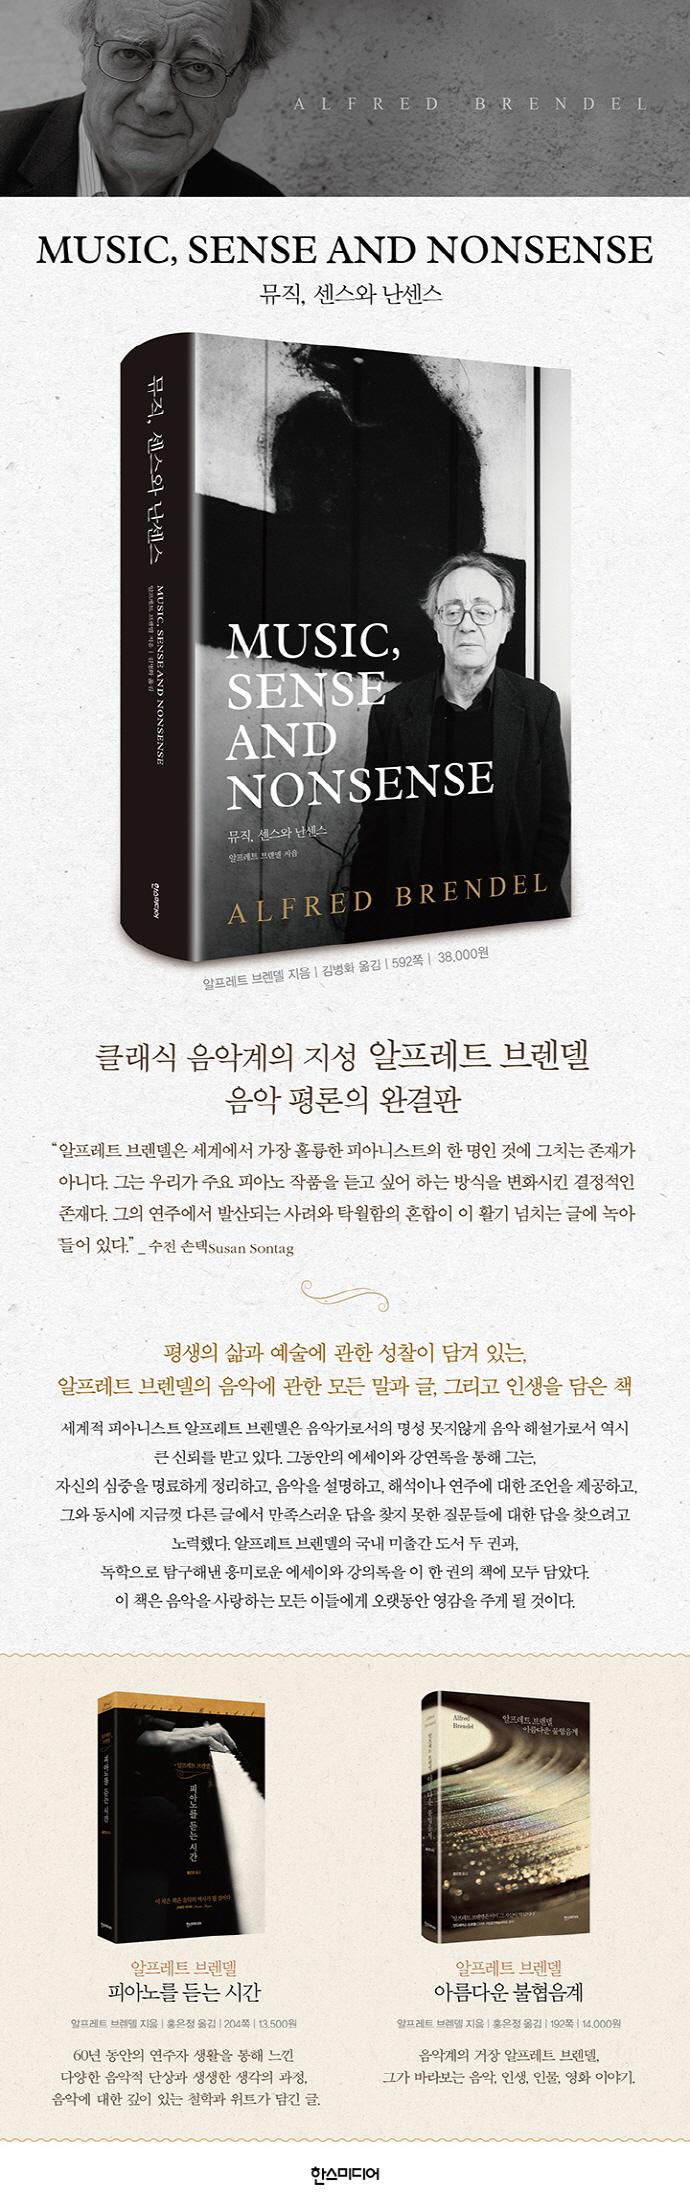 Music, Sense And Nonsense(알프레트 브렌델 뮤직, 센스와 난센스)(양장본 HardCover) 도서 상세이미지